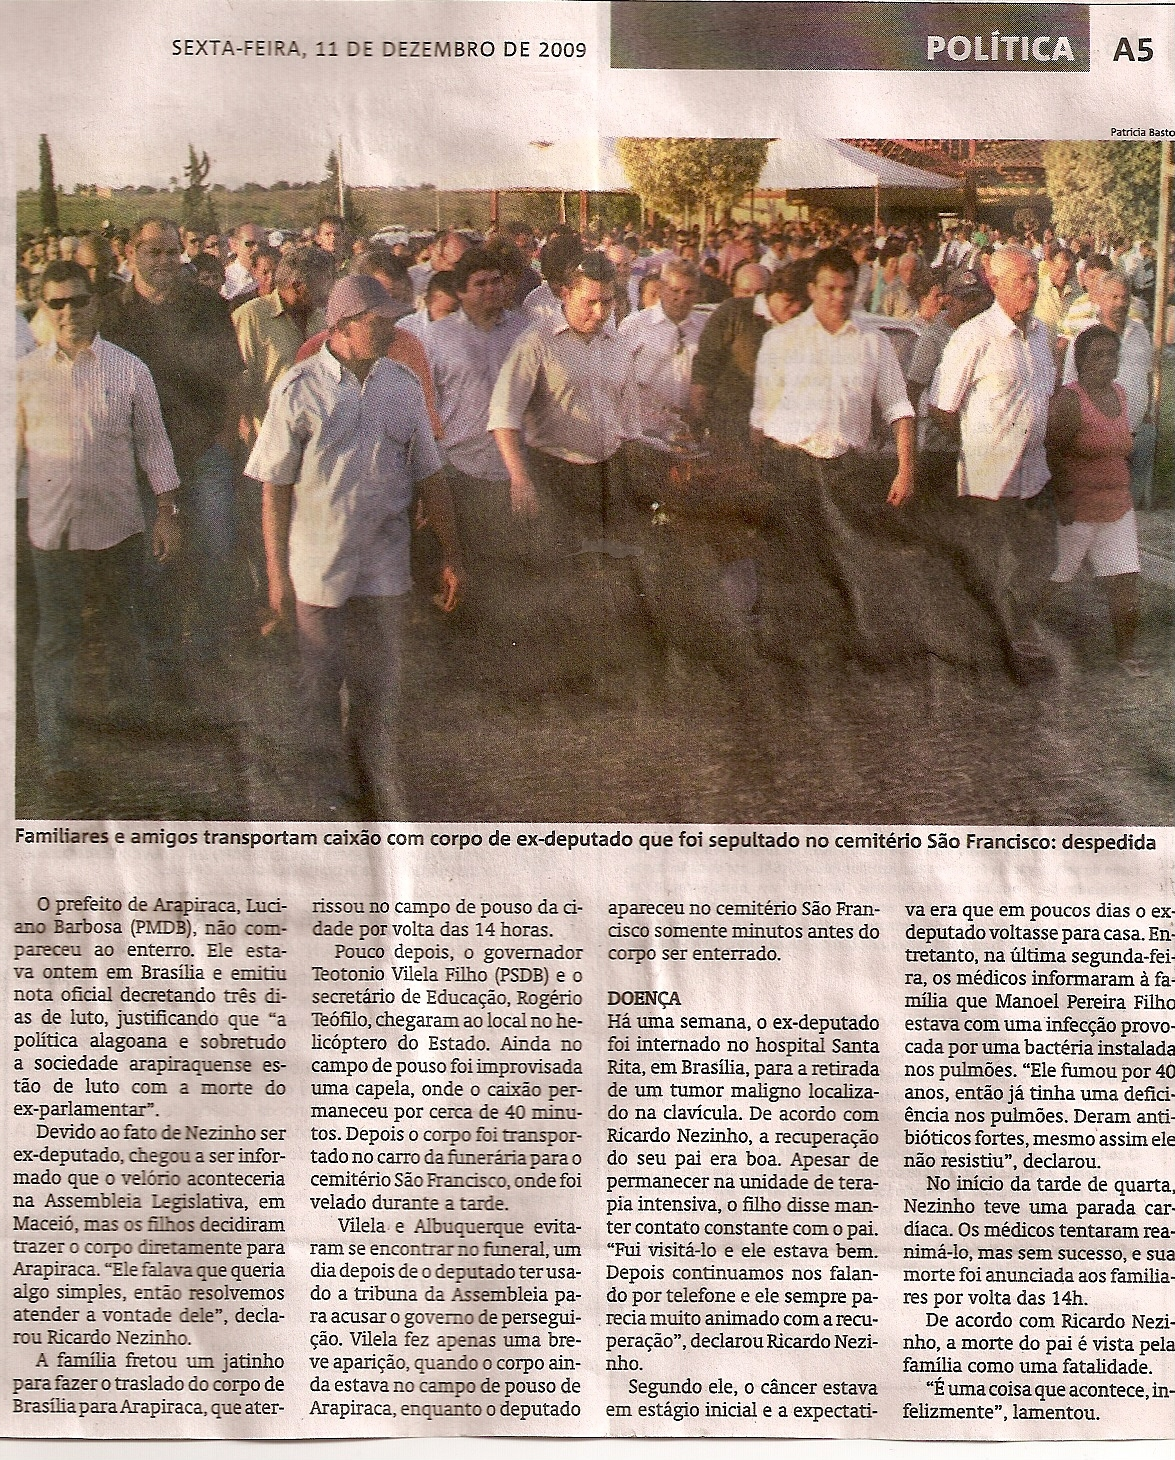 gazeta_11_12_2009_2 - Cópia